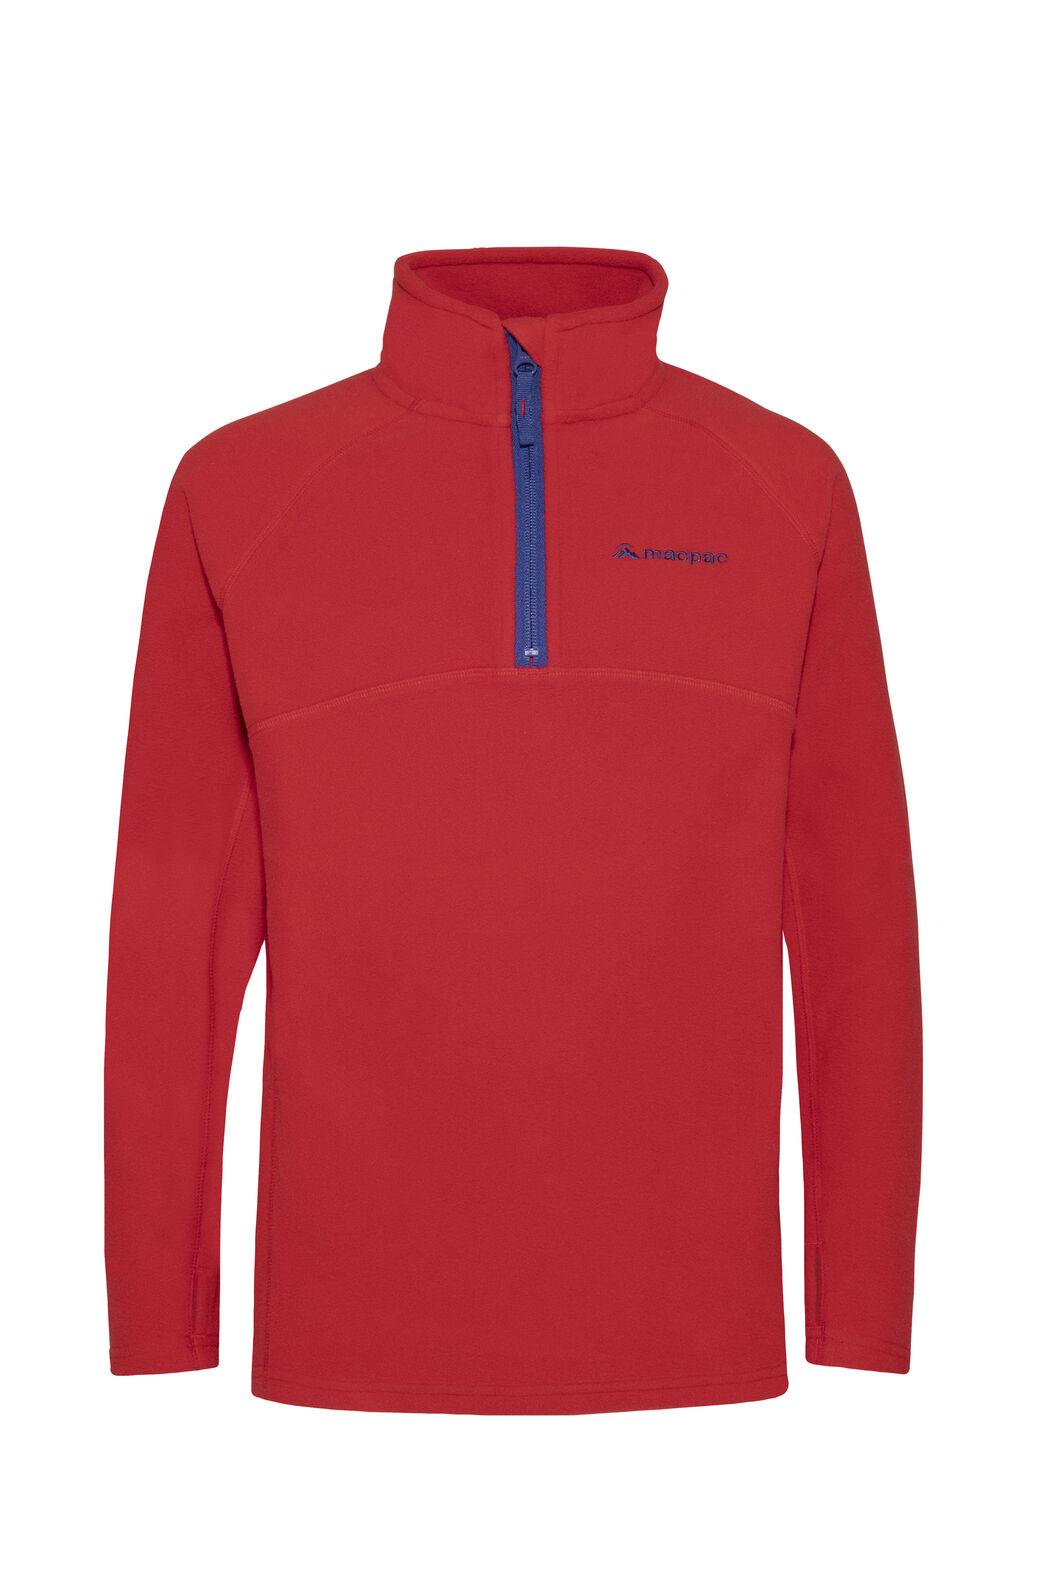 Macpac Tui Polartec® Fleece Pullover — Kids', Samba, hi-res